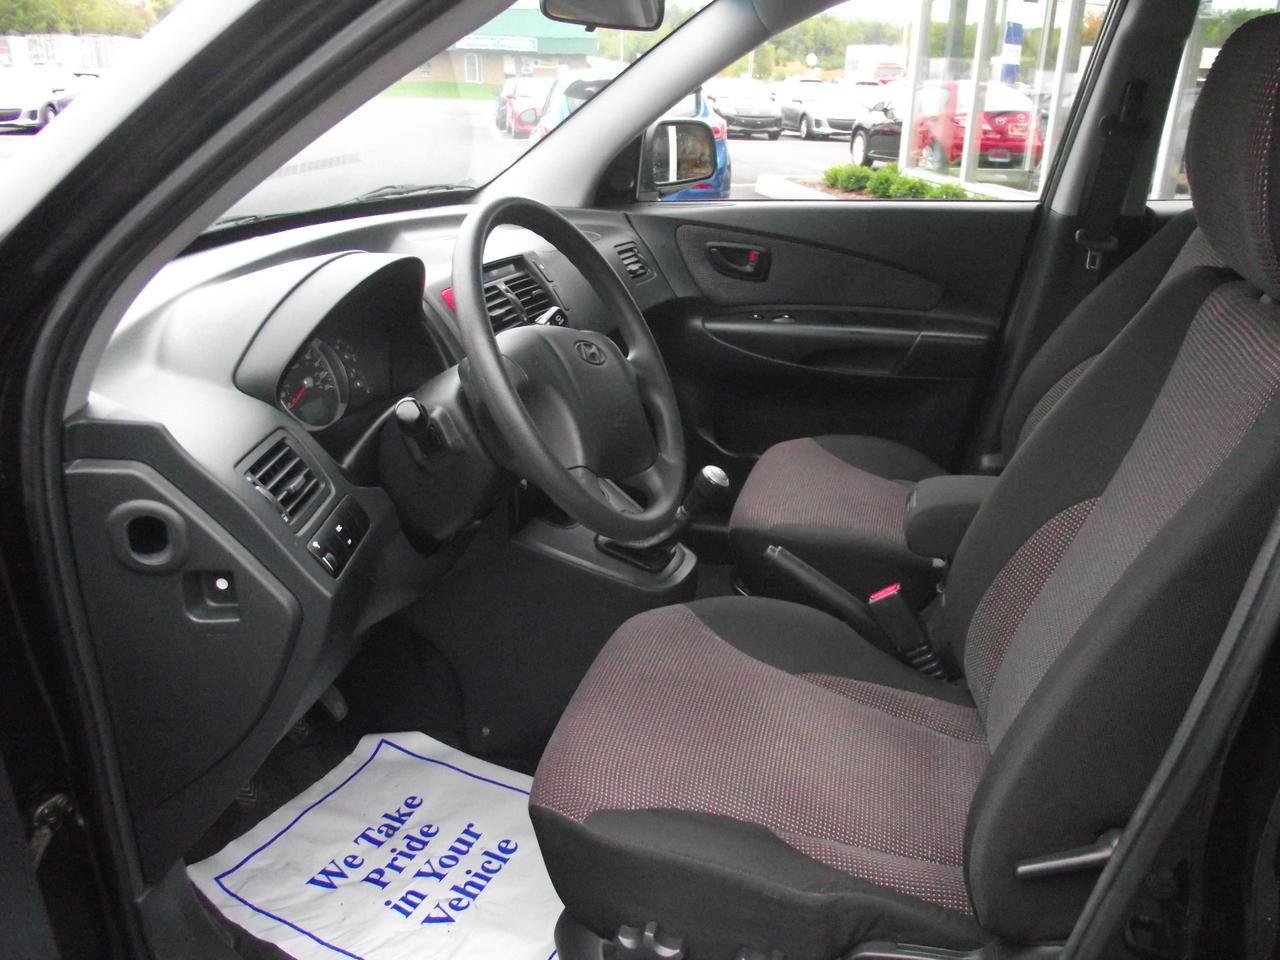 Used 2007 Hyundai Tucson Gl In Kentville Used Inventory Kentville Mazda In Kentville Nova